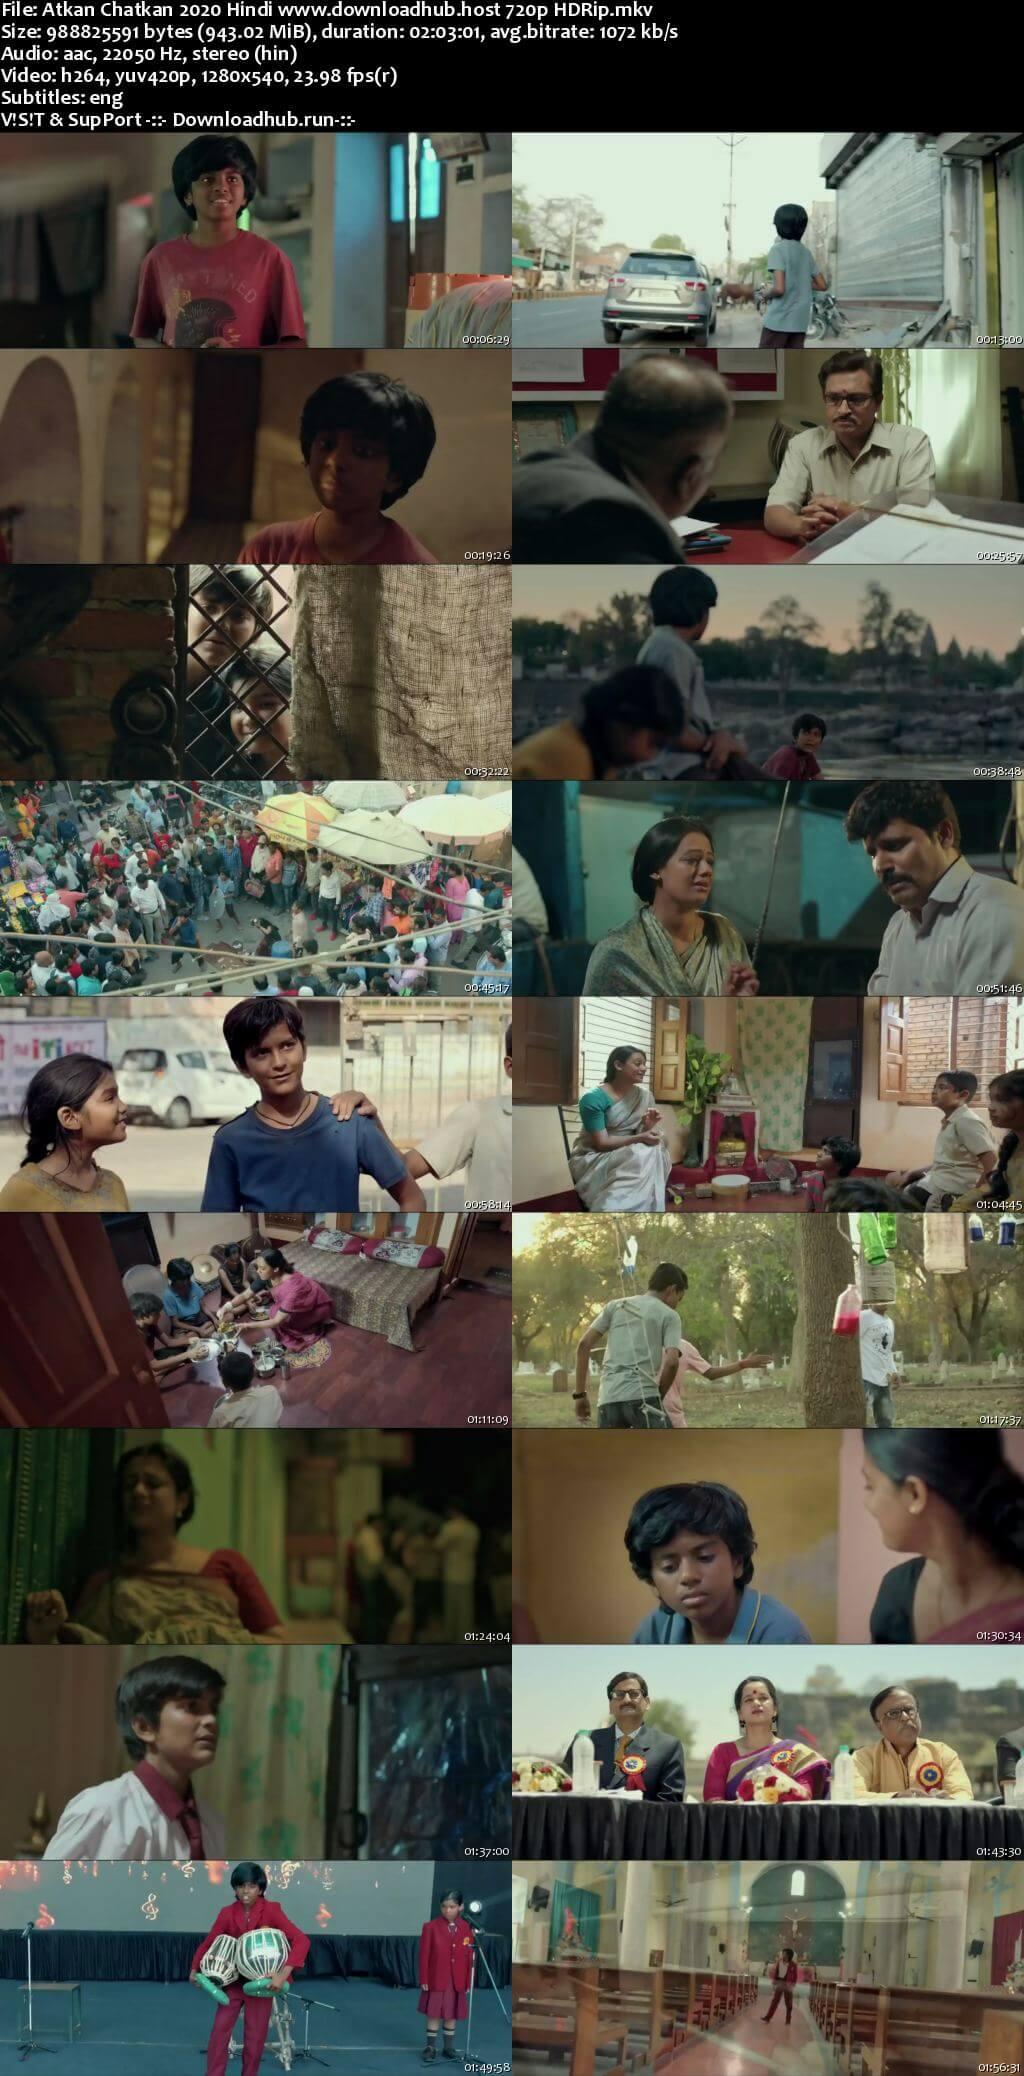 Atkan Chatkan 2020 Hindi 720p HDRip ESubs